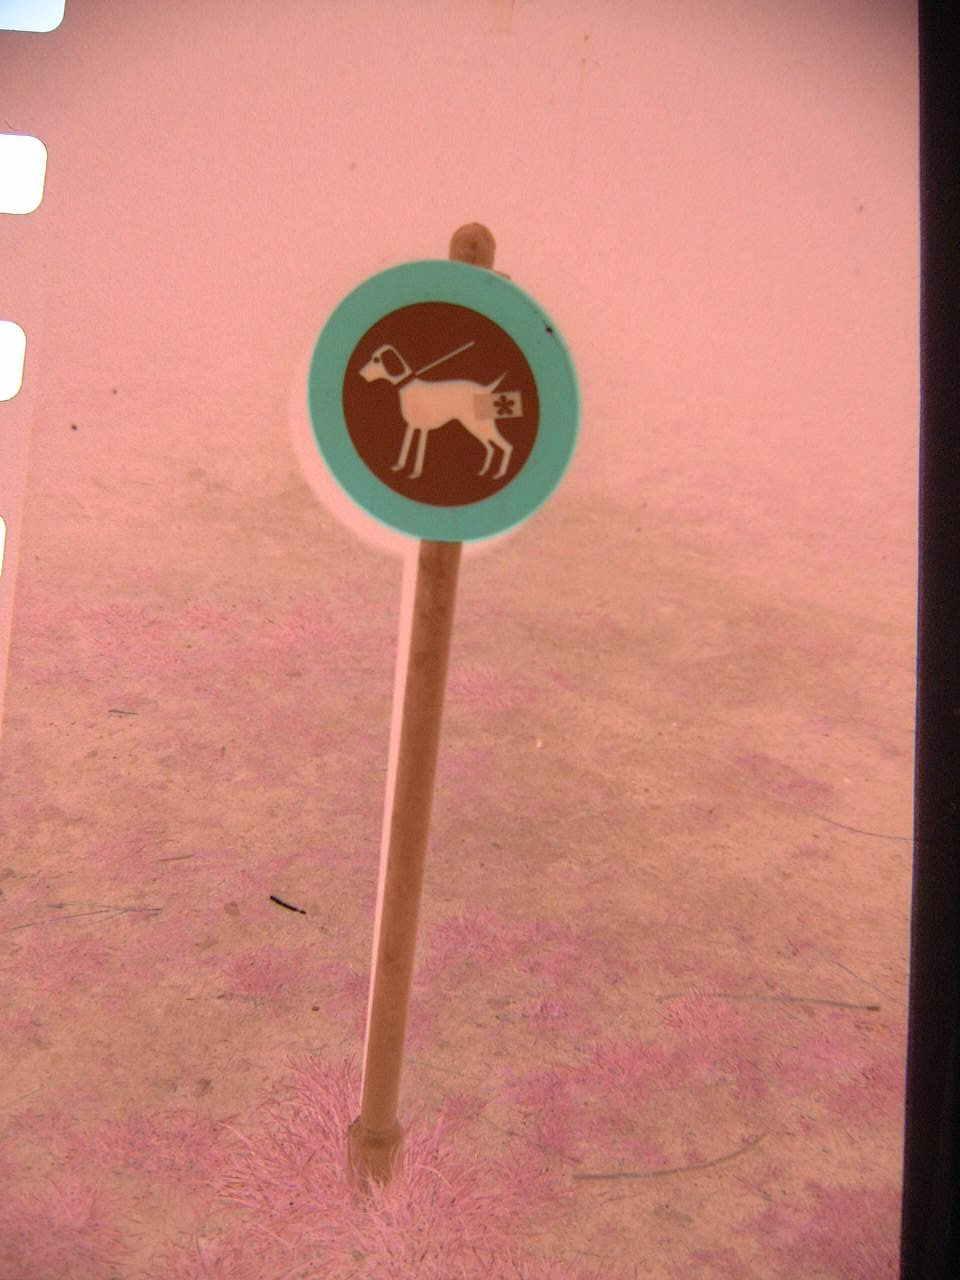 maartent dog poop sign forbidden round red green